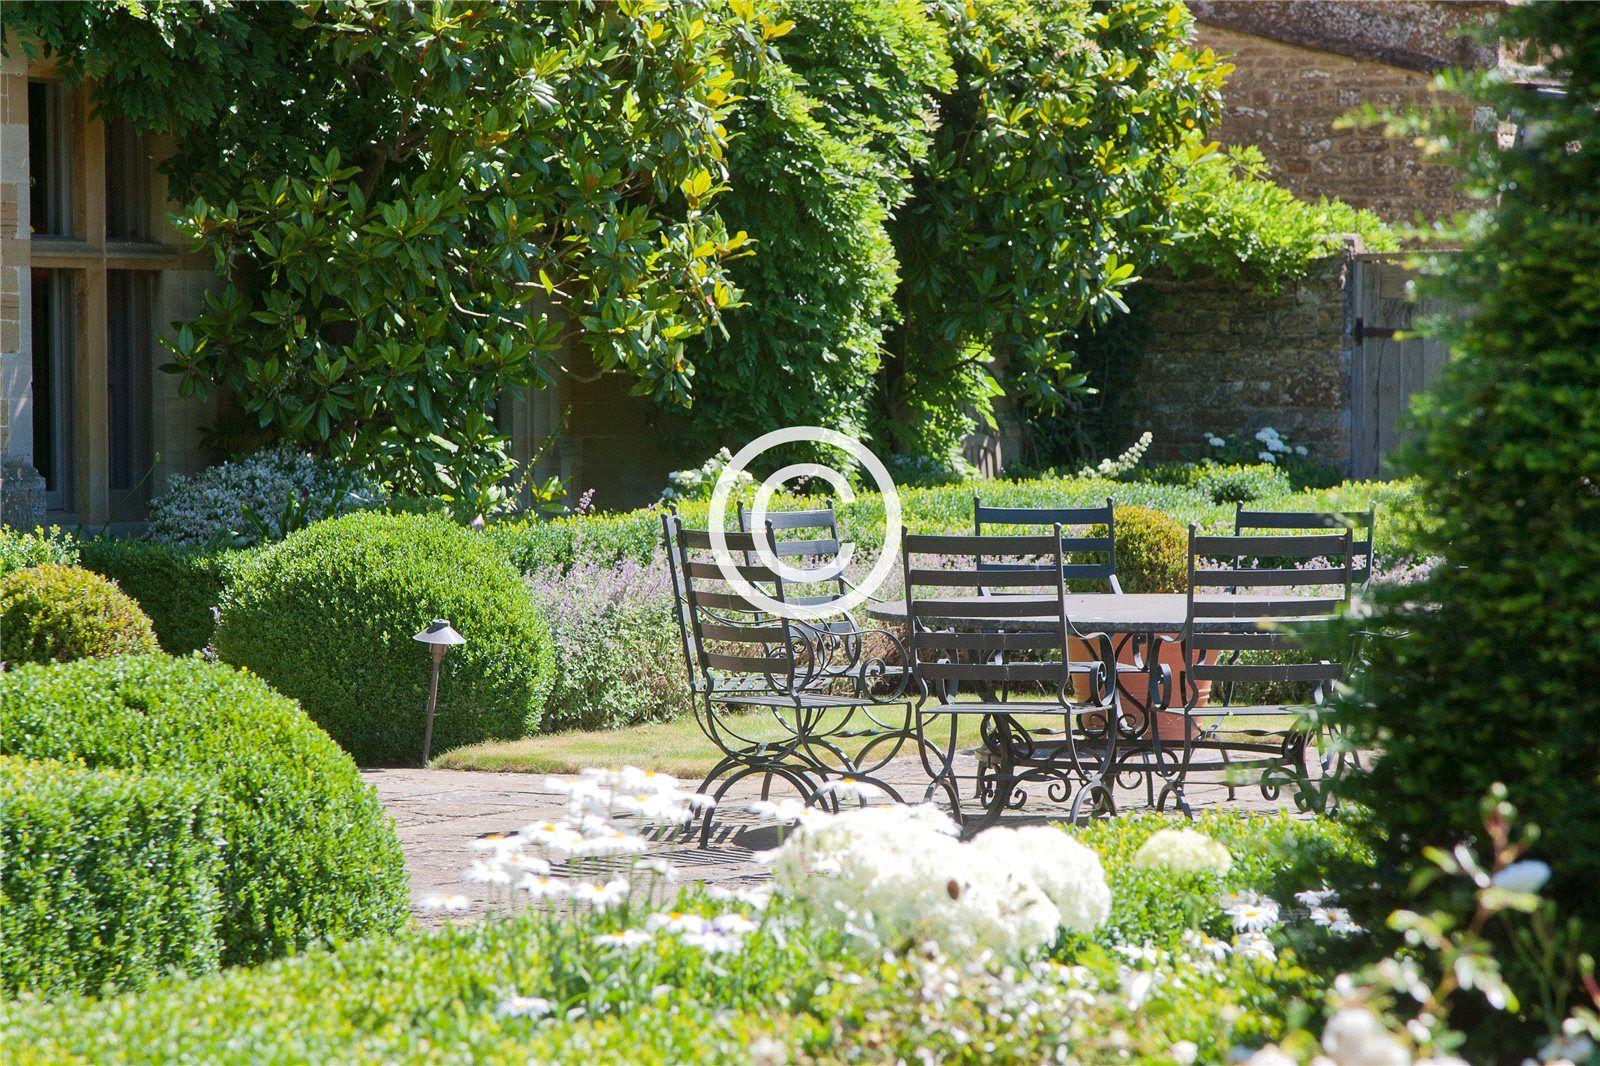 North Aston Hall - The Gardens